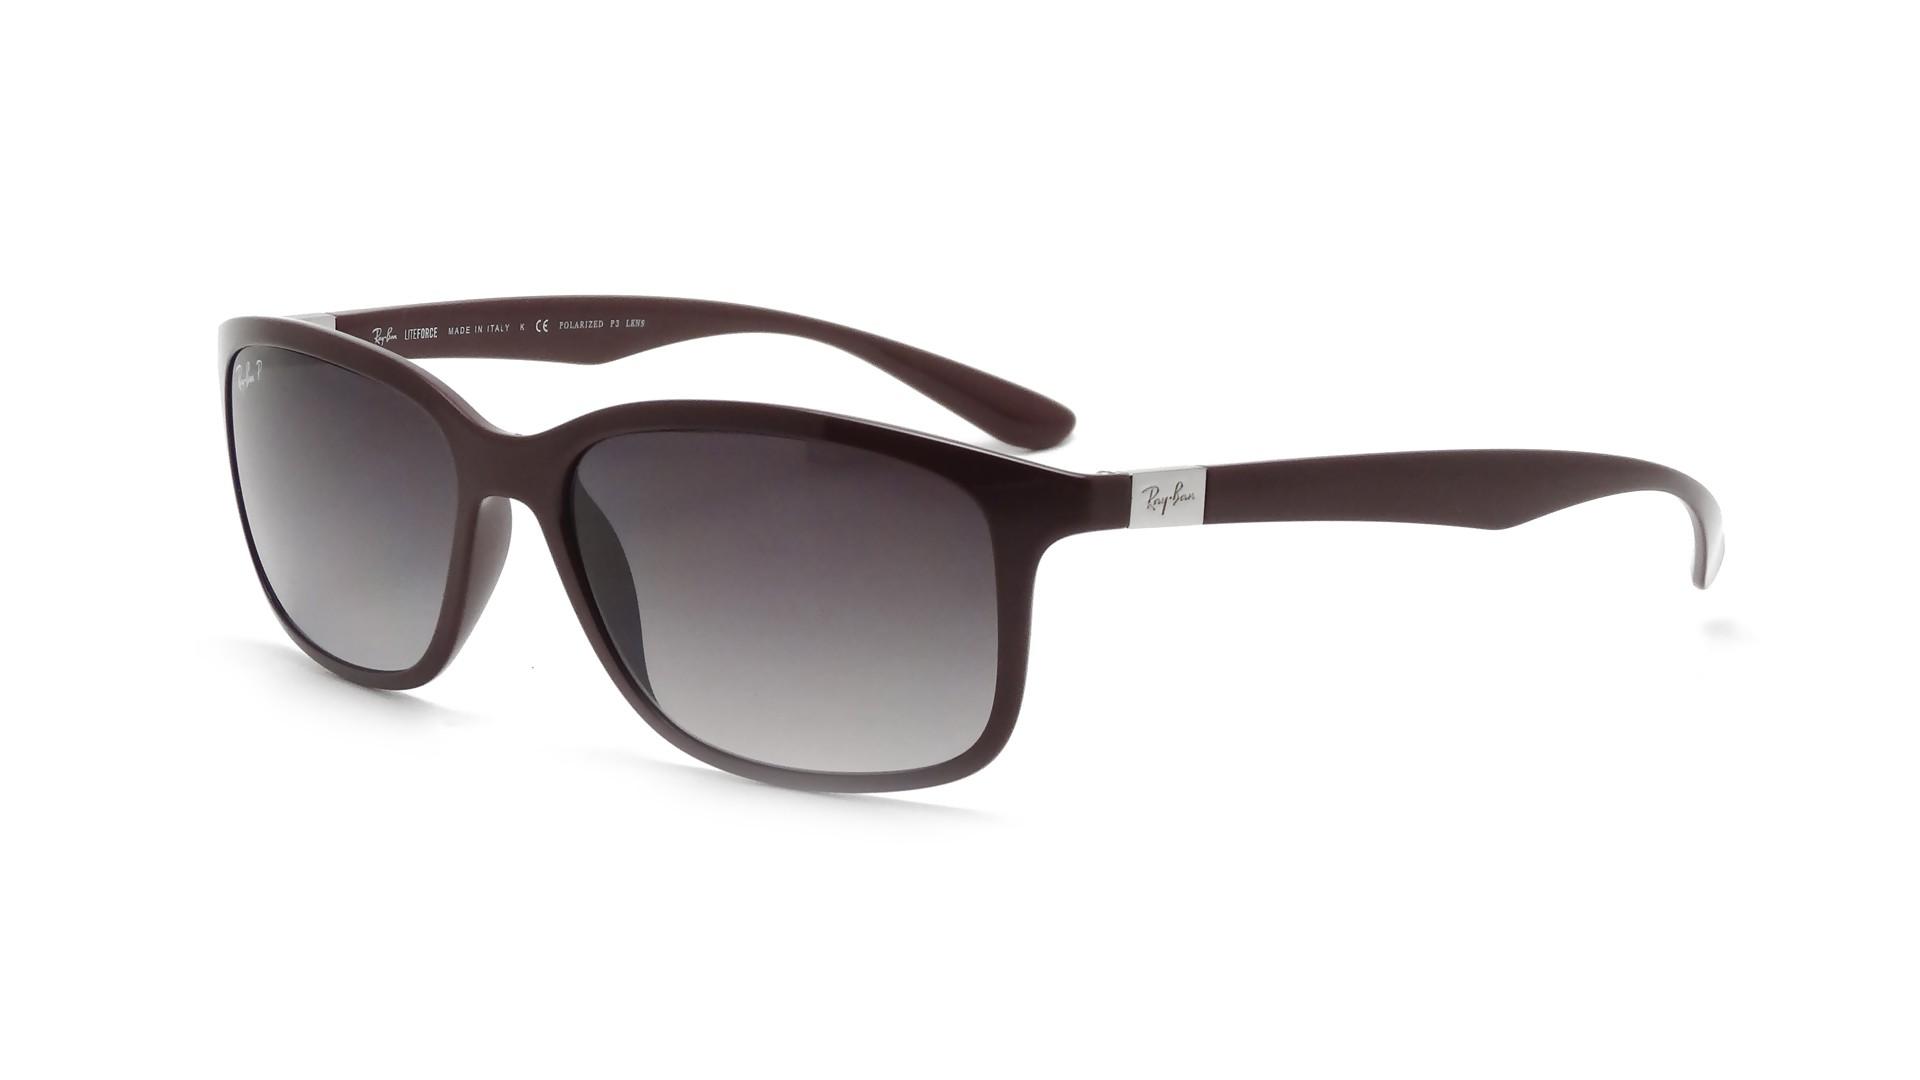 639b84f8fb Sunglasses Ray-Ban Tech Liteforce Purple RB4215 6128 T3 57-16 Large  Polarized Gradient